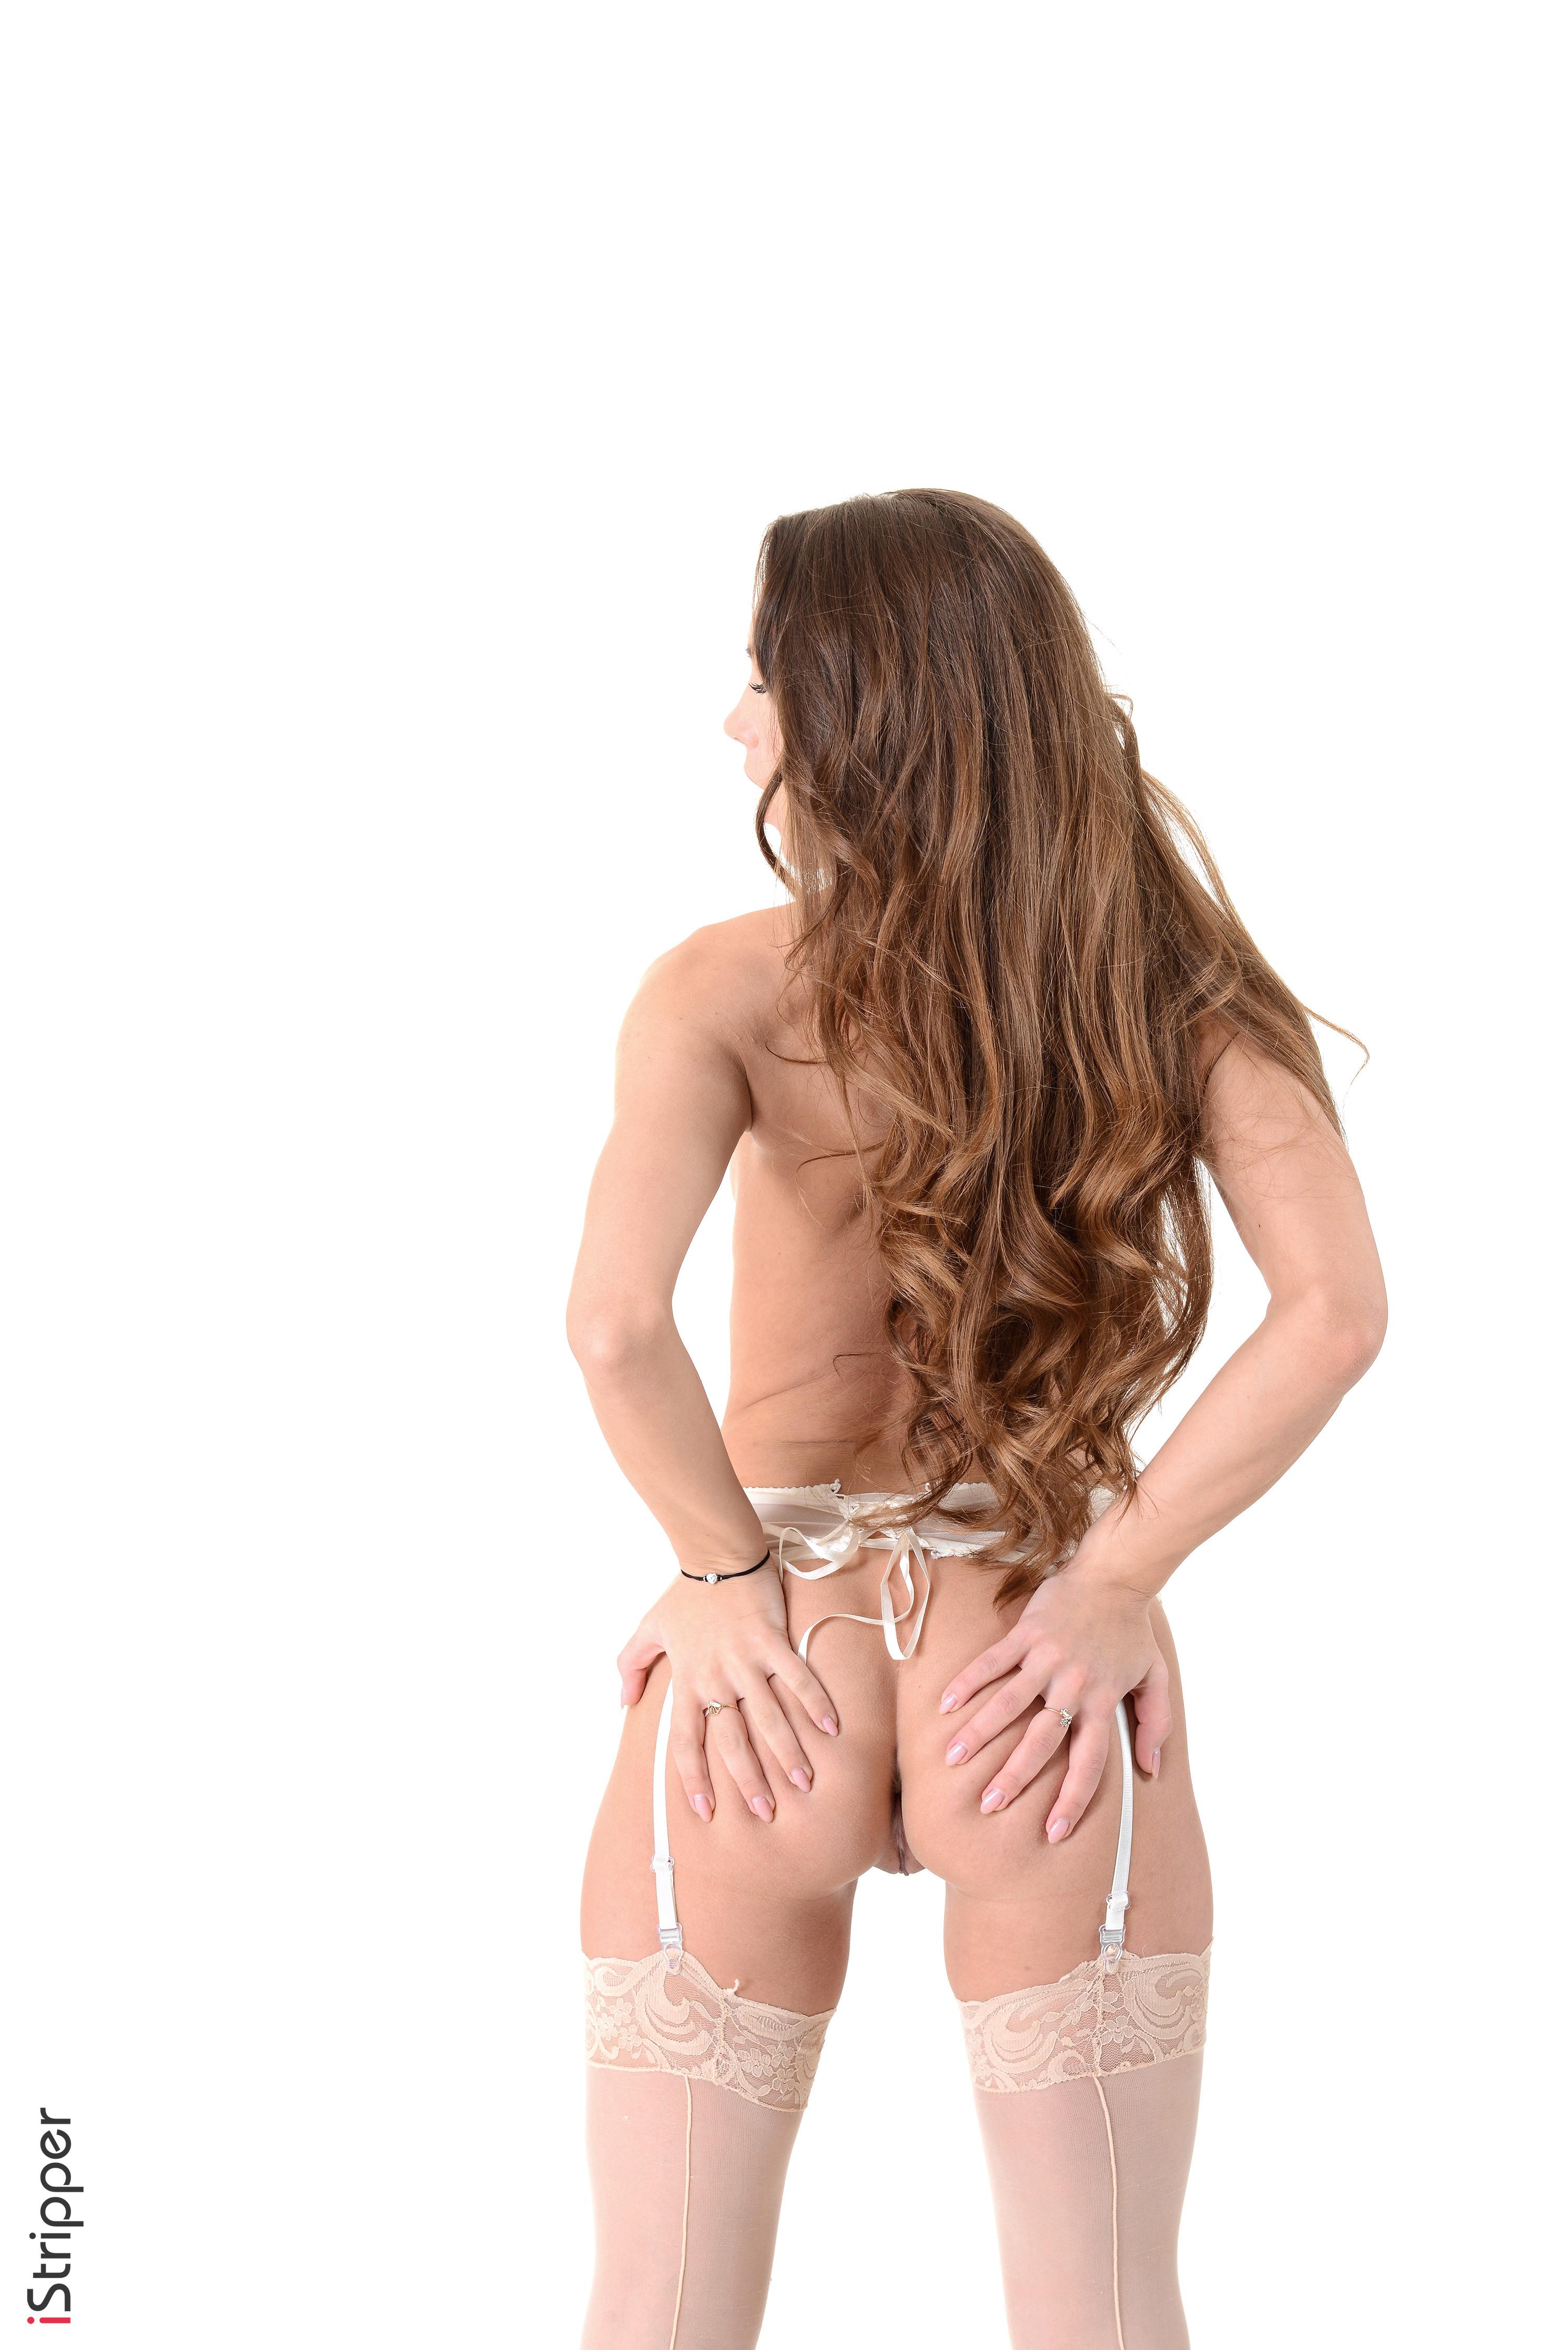 hentai desktop stripper